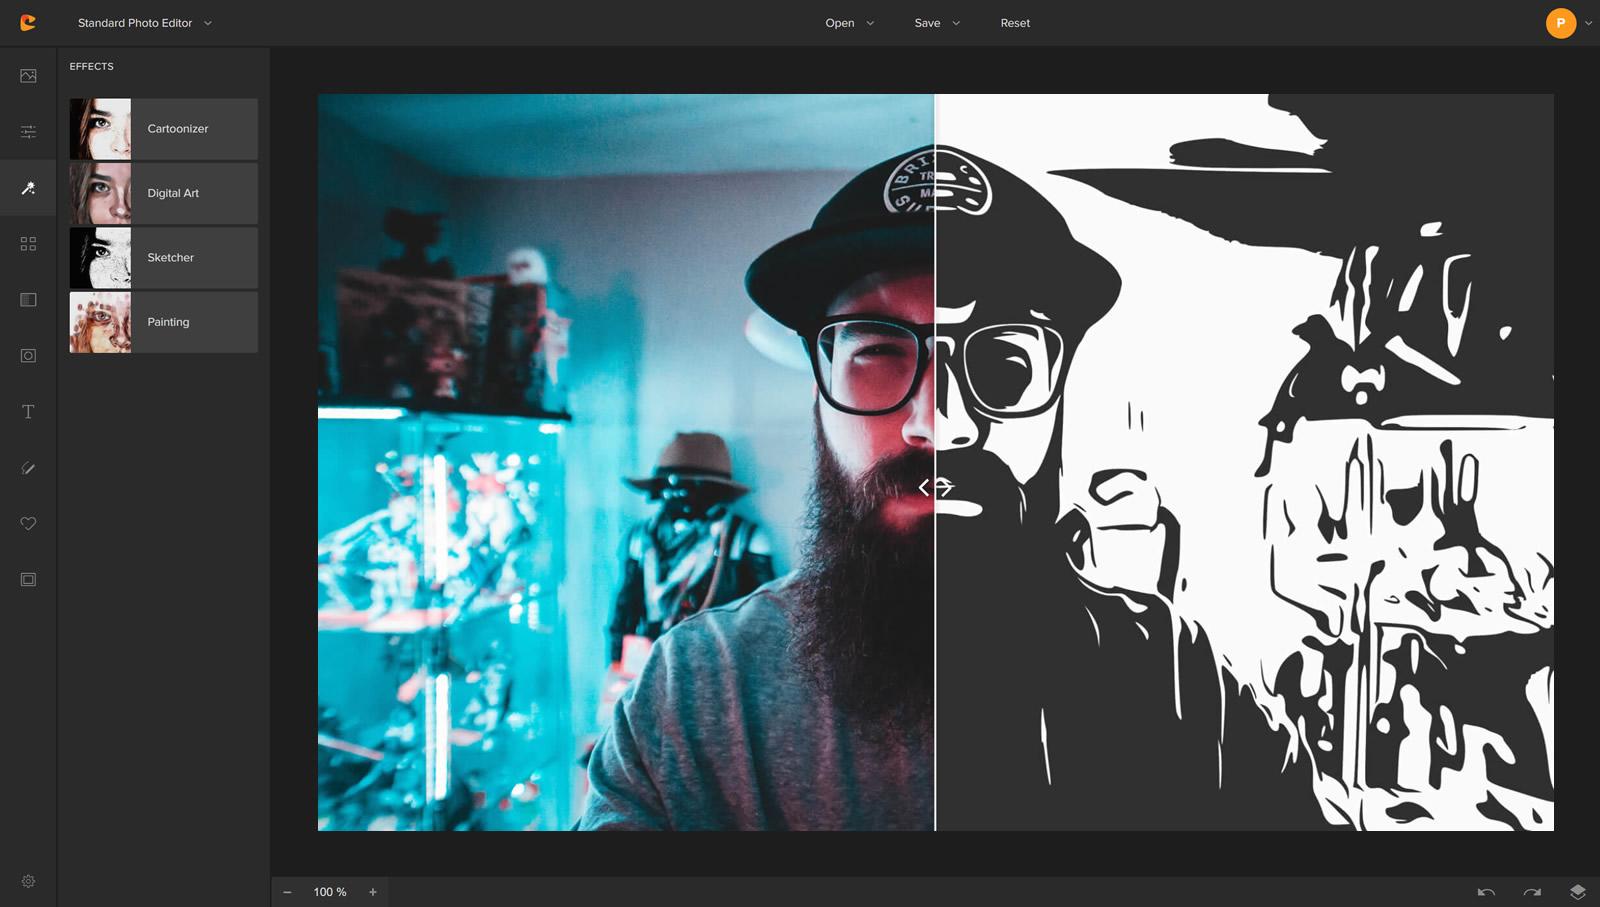 Colorcinch Photo Editor & Cartoonizer